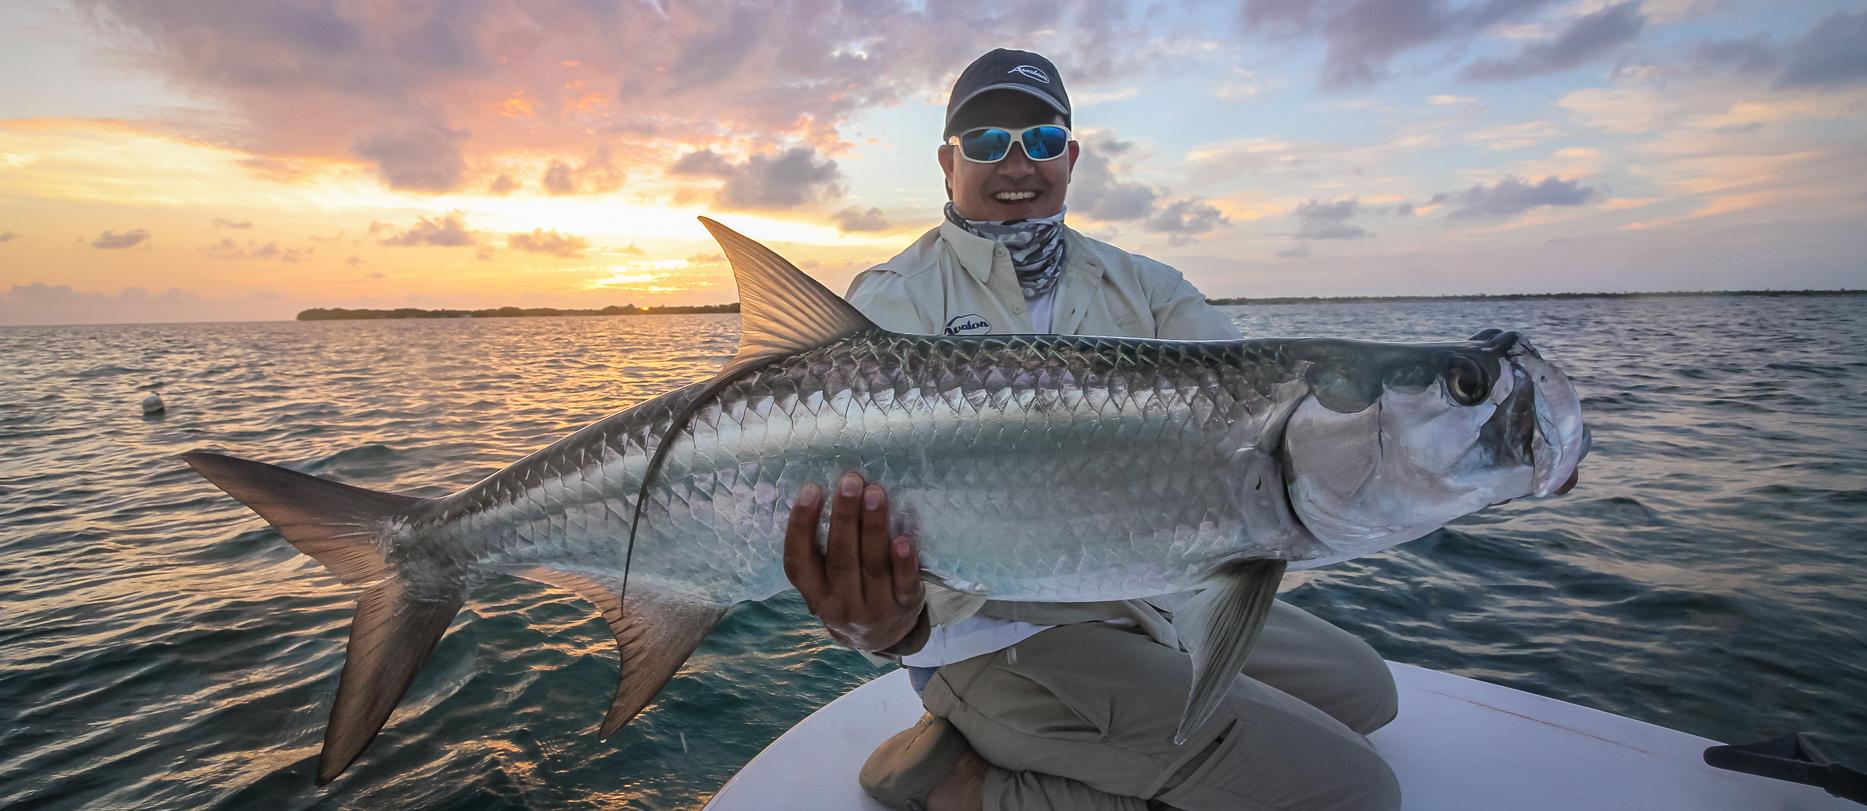 Cuba fly fishing trips, Cuba fishing, tarpon, bonefish, permit, saltwater fly fishing